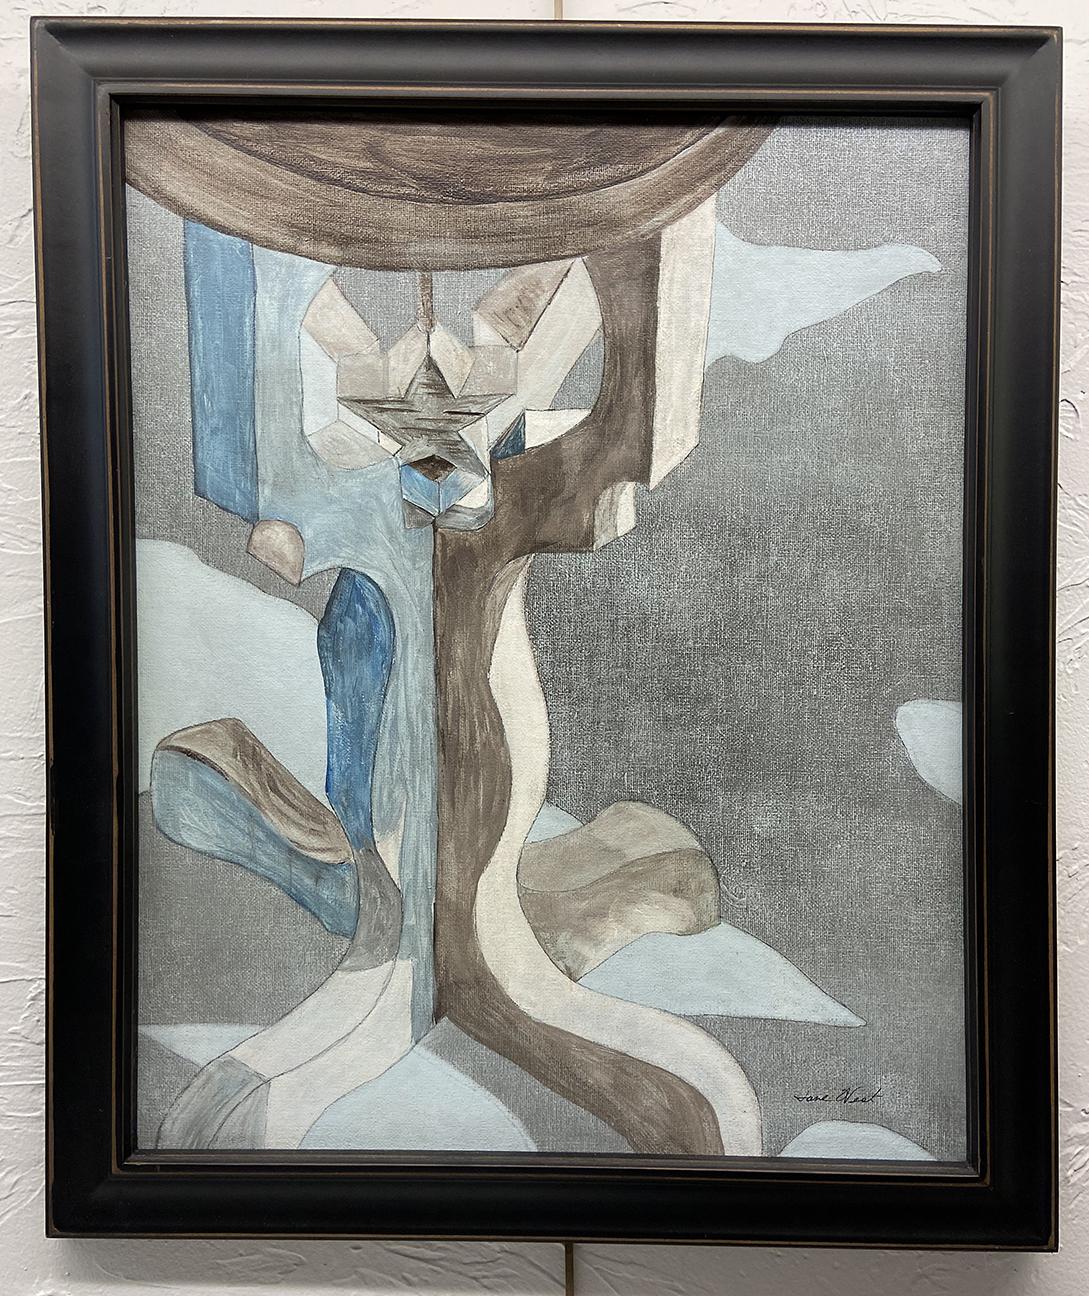 #13 Pedestal, Jane West, Acrylic (19 x 23), $35.00 suggested minimum bid  (109 meals)